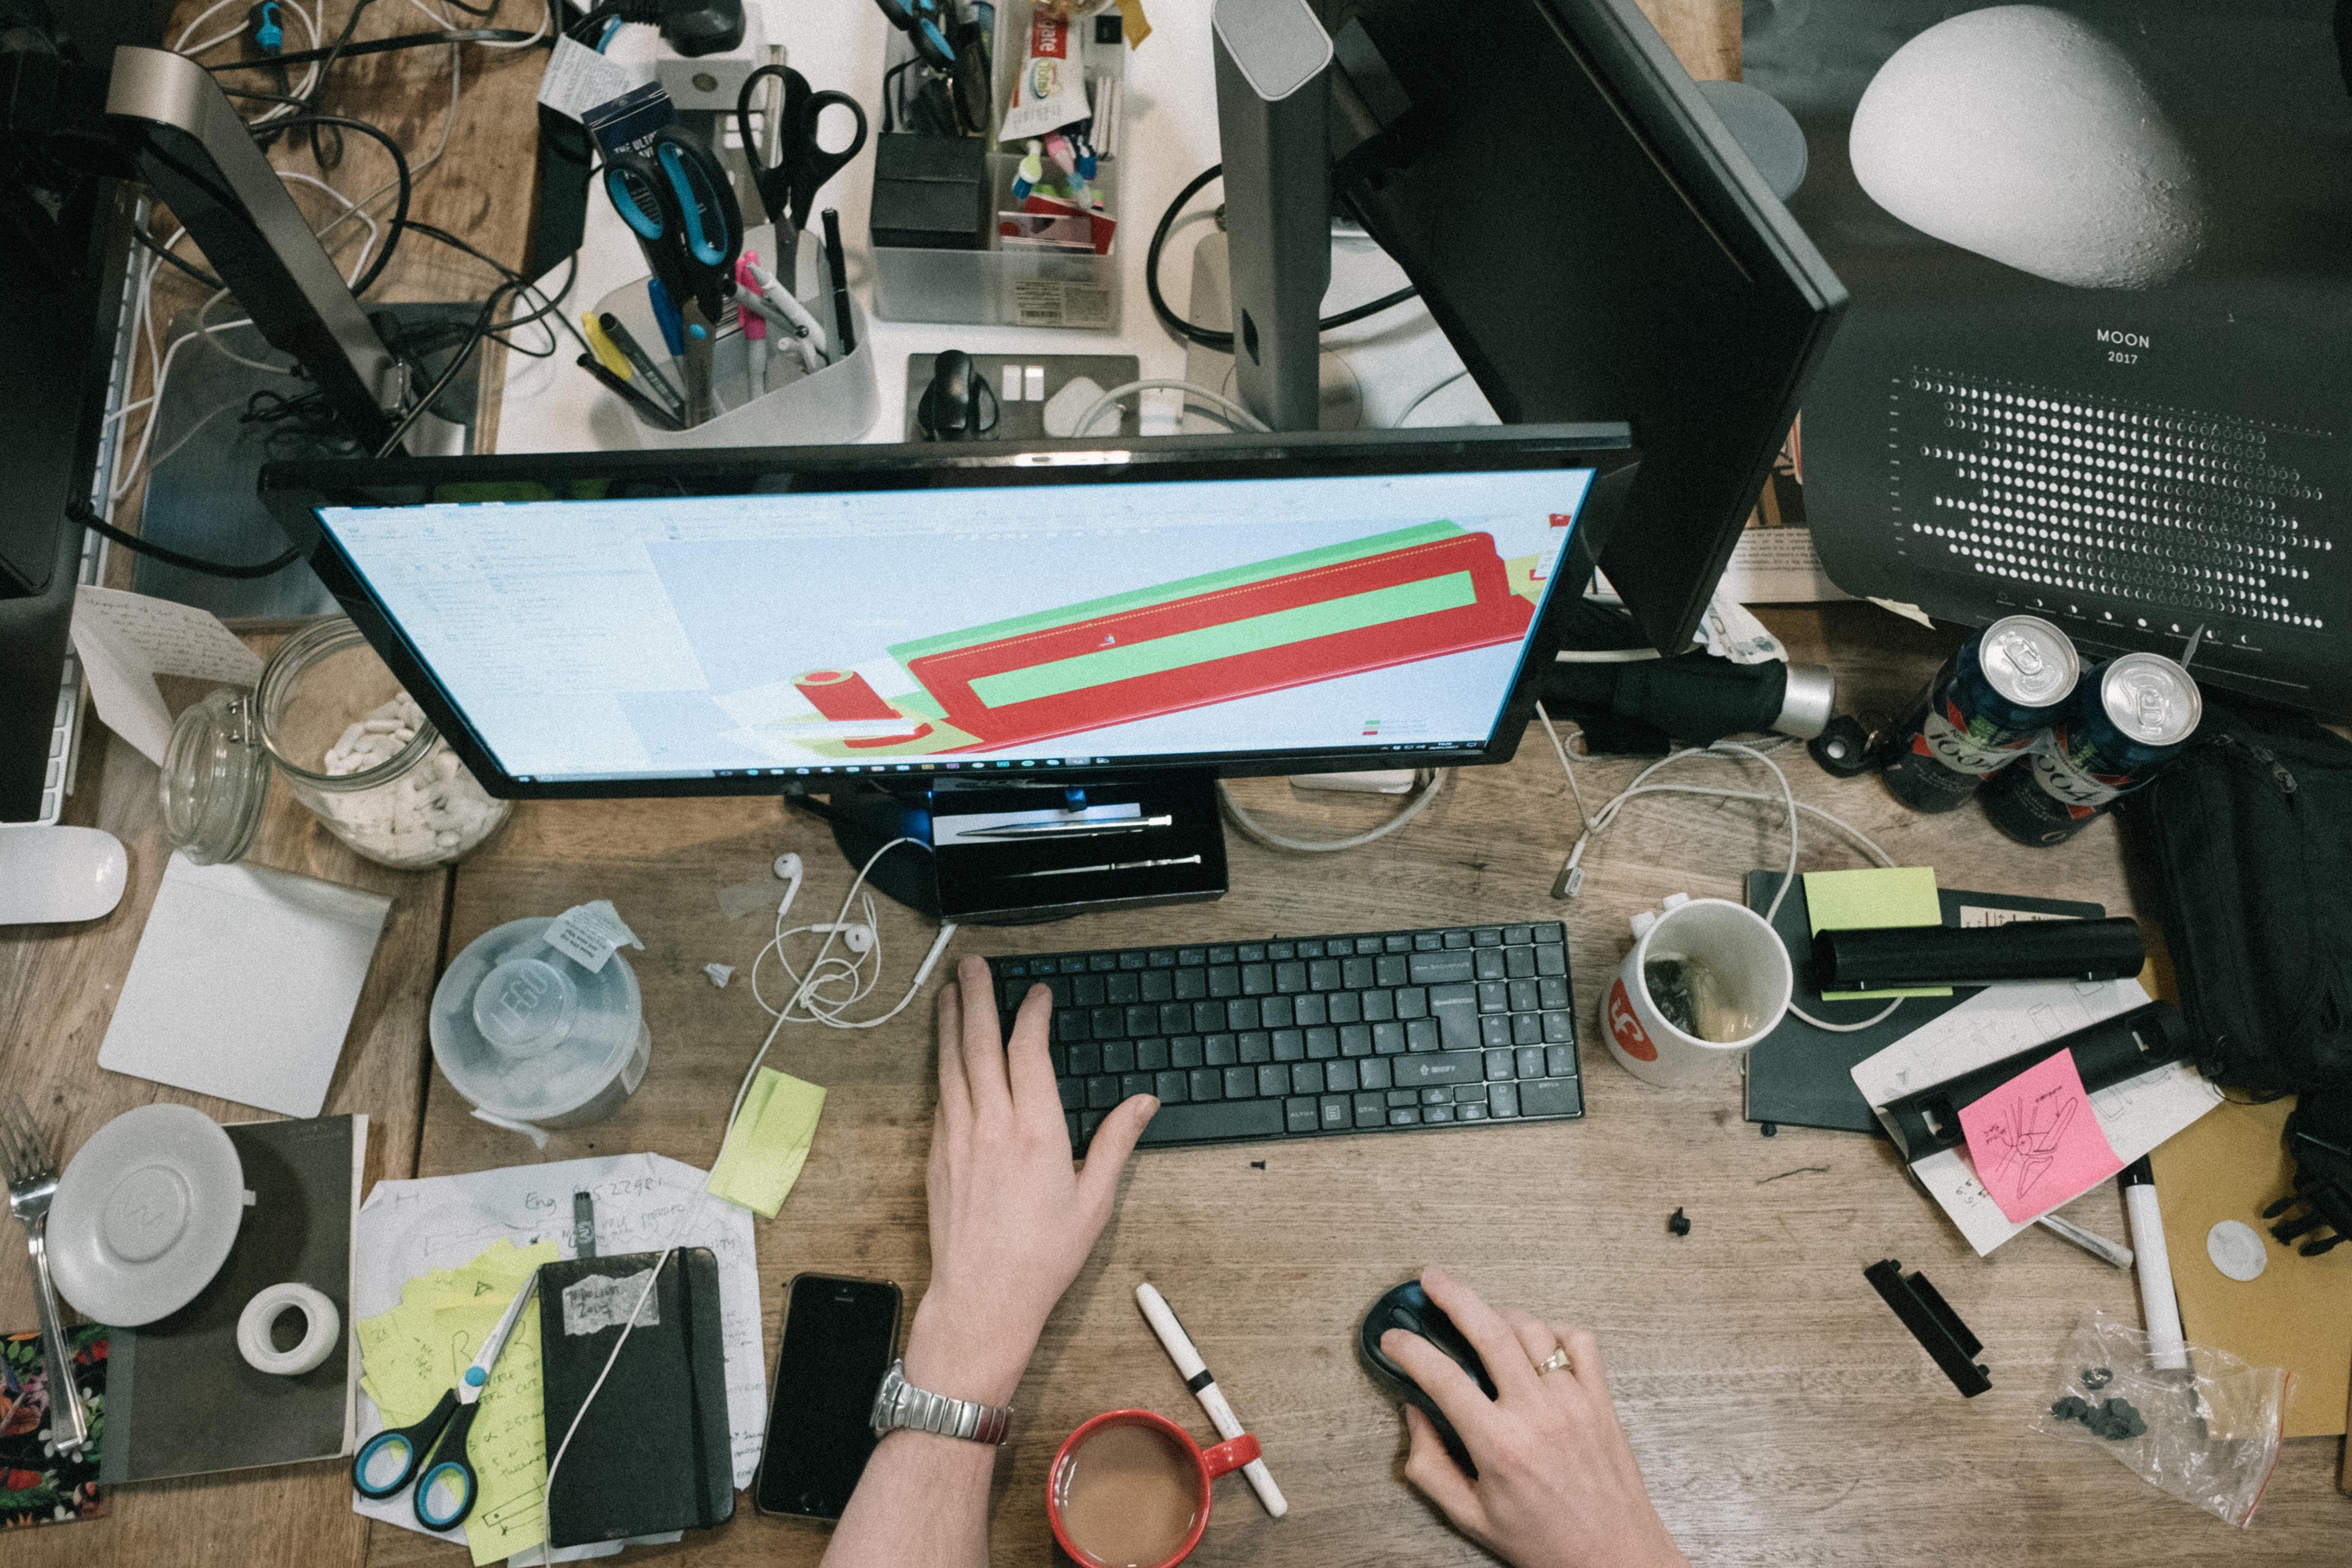 A cluttered work desk